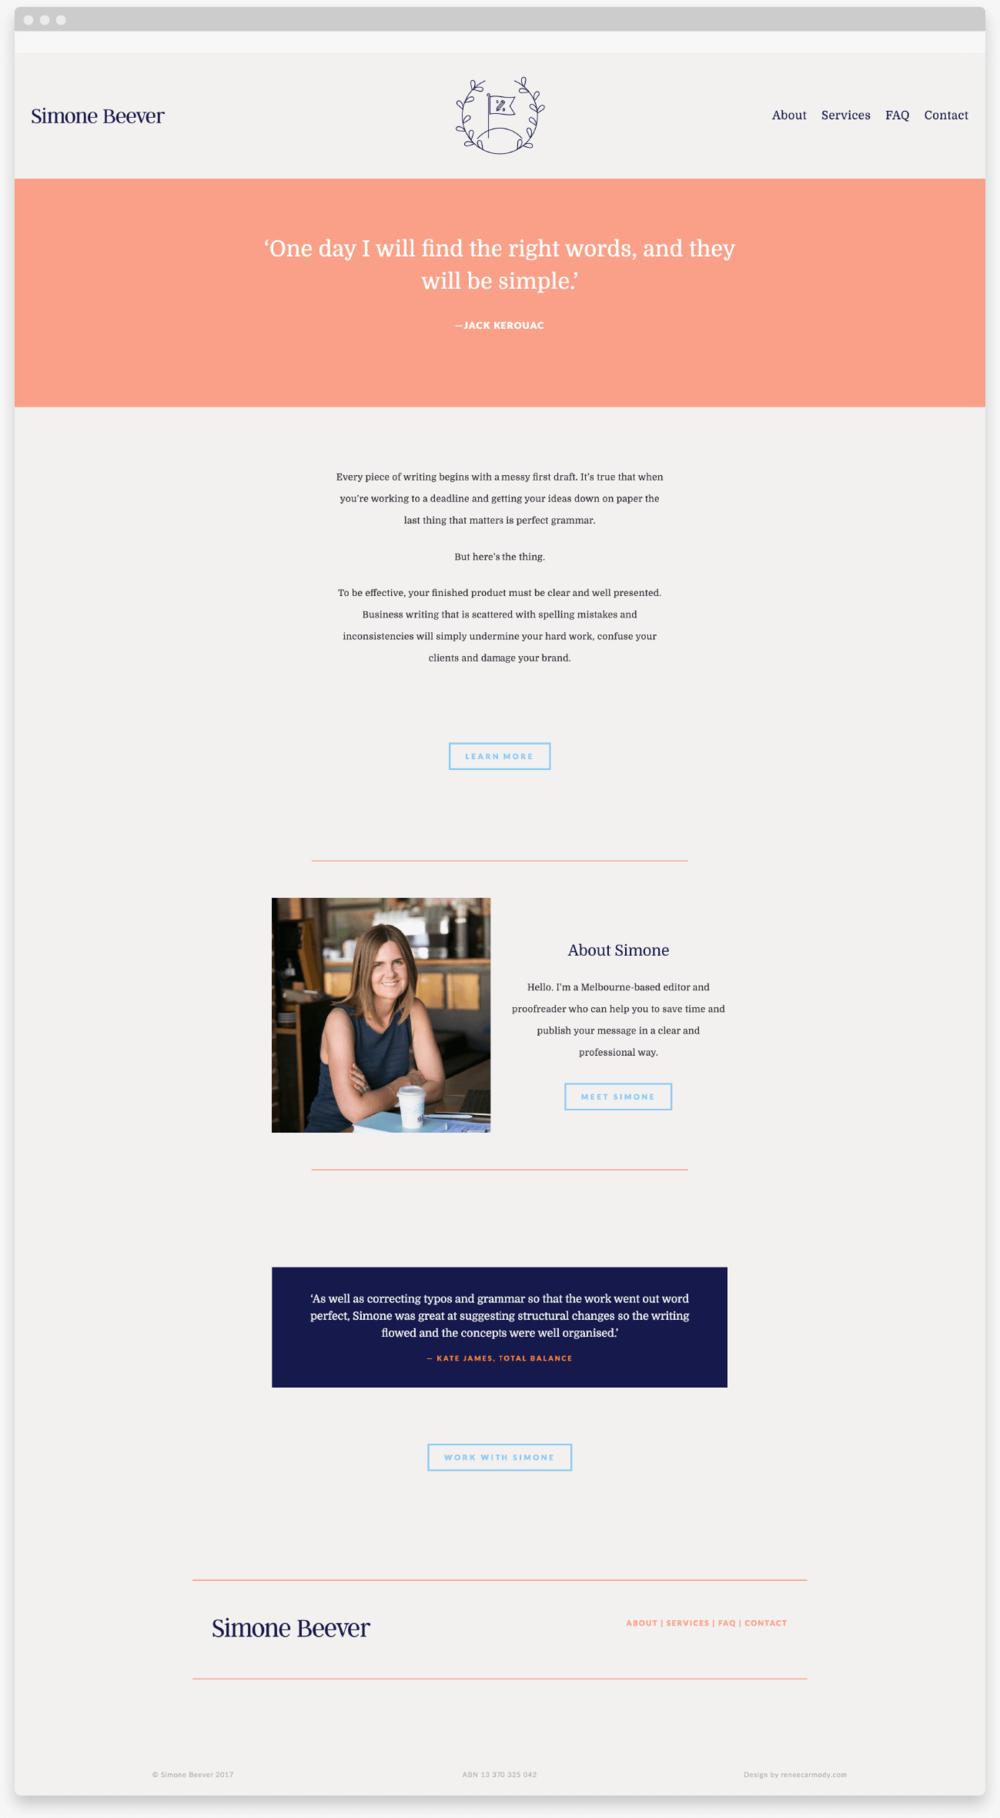 Brand and website design for Melbourne-based writer, editor and proofreader, Simone Beever by Renée Carmody Design. reneecarmody.com